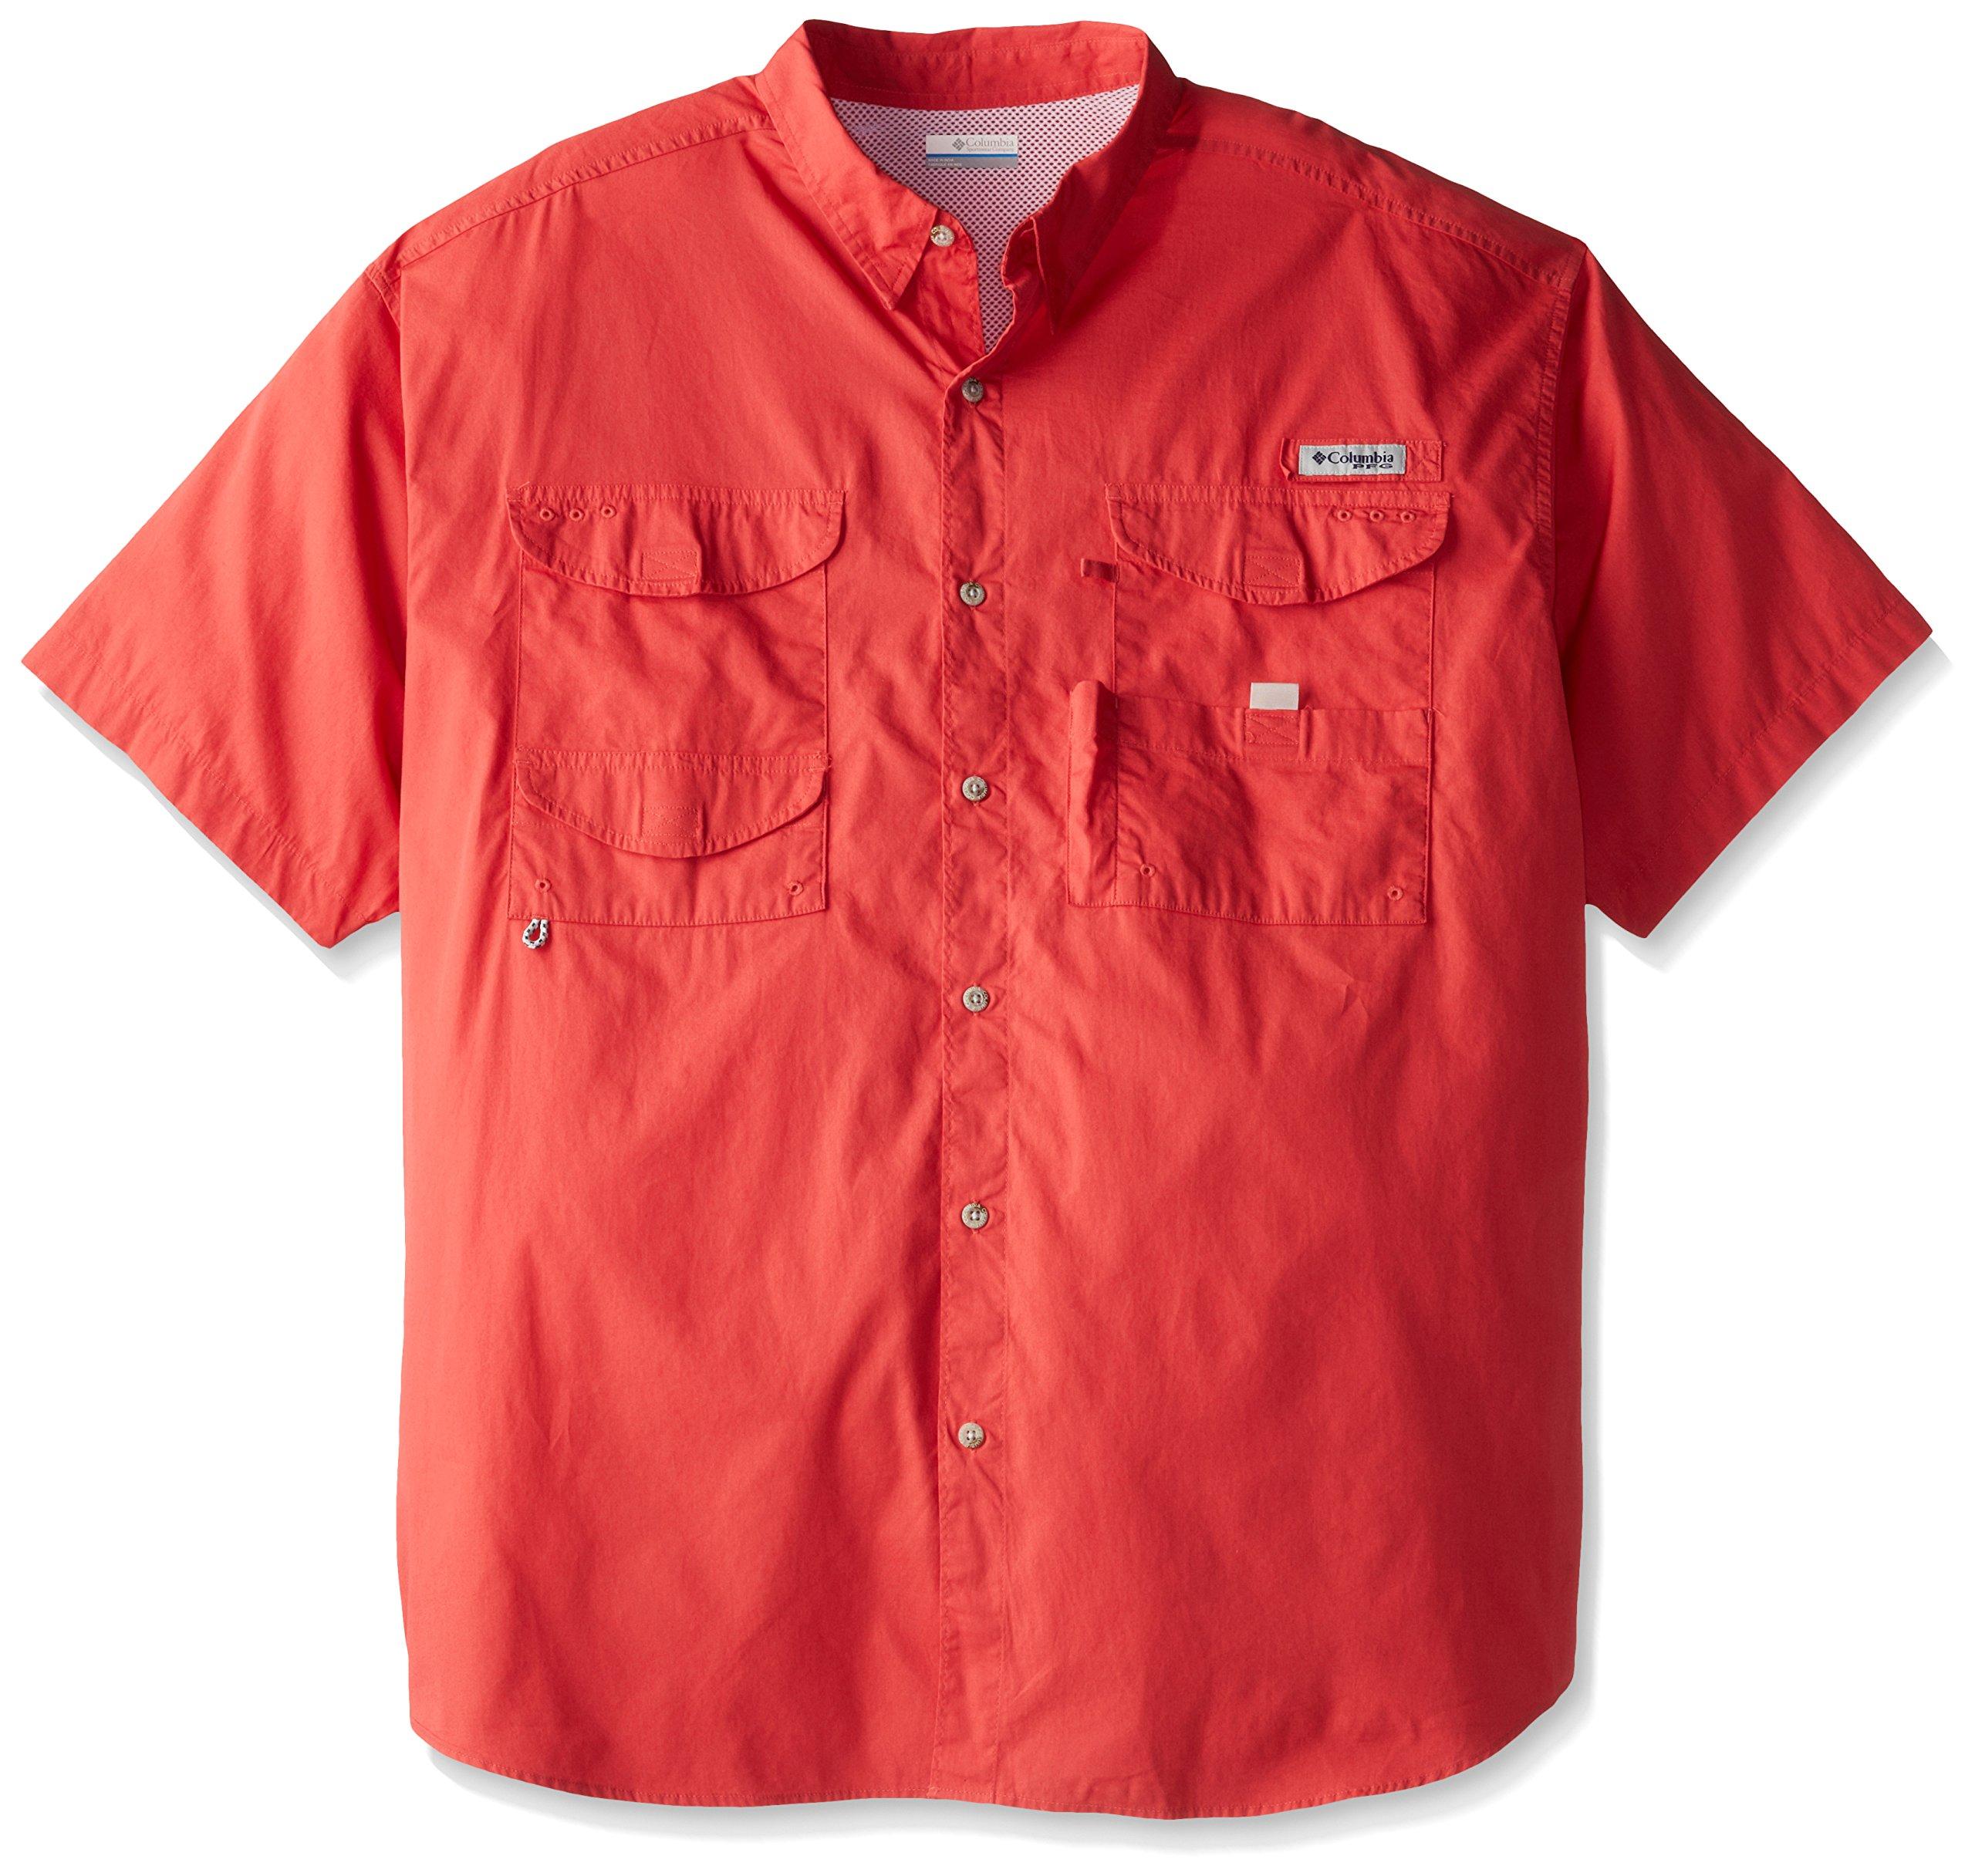 Columbia Men's Bonehead Short Sleeve Shirt, Sunset Red, XX-Large by Columbia